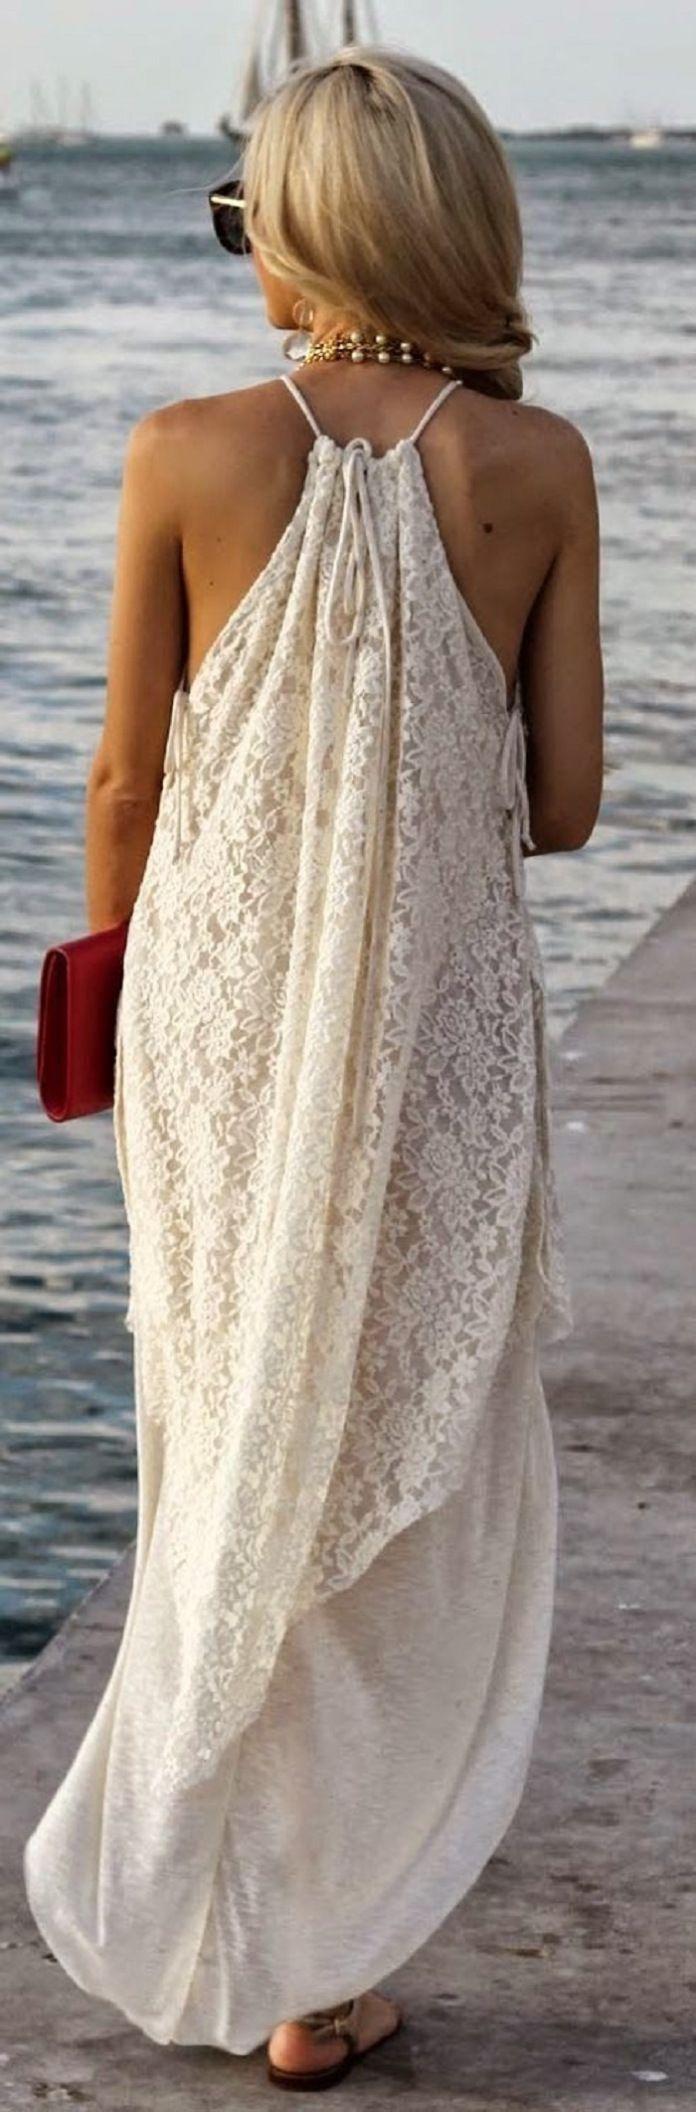 Thin strap lacy long maxi dress